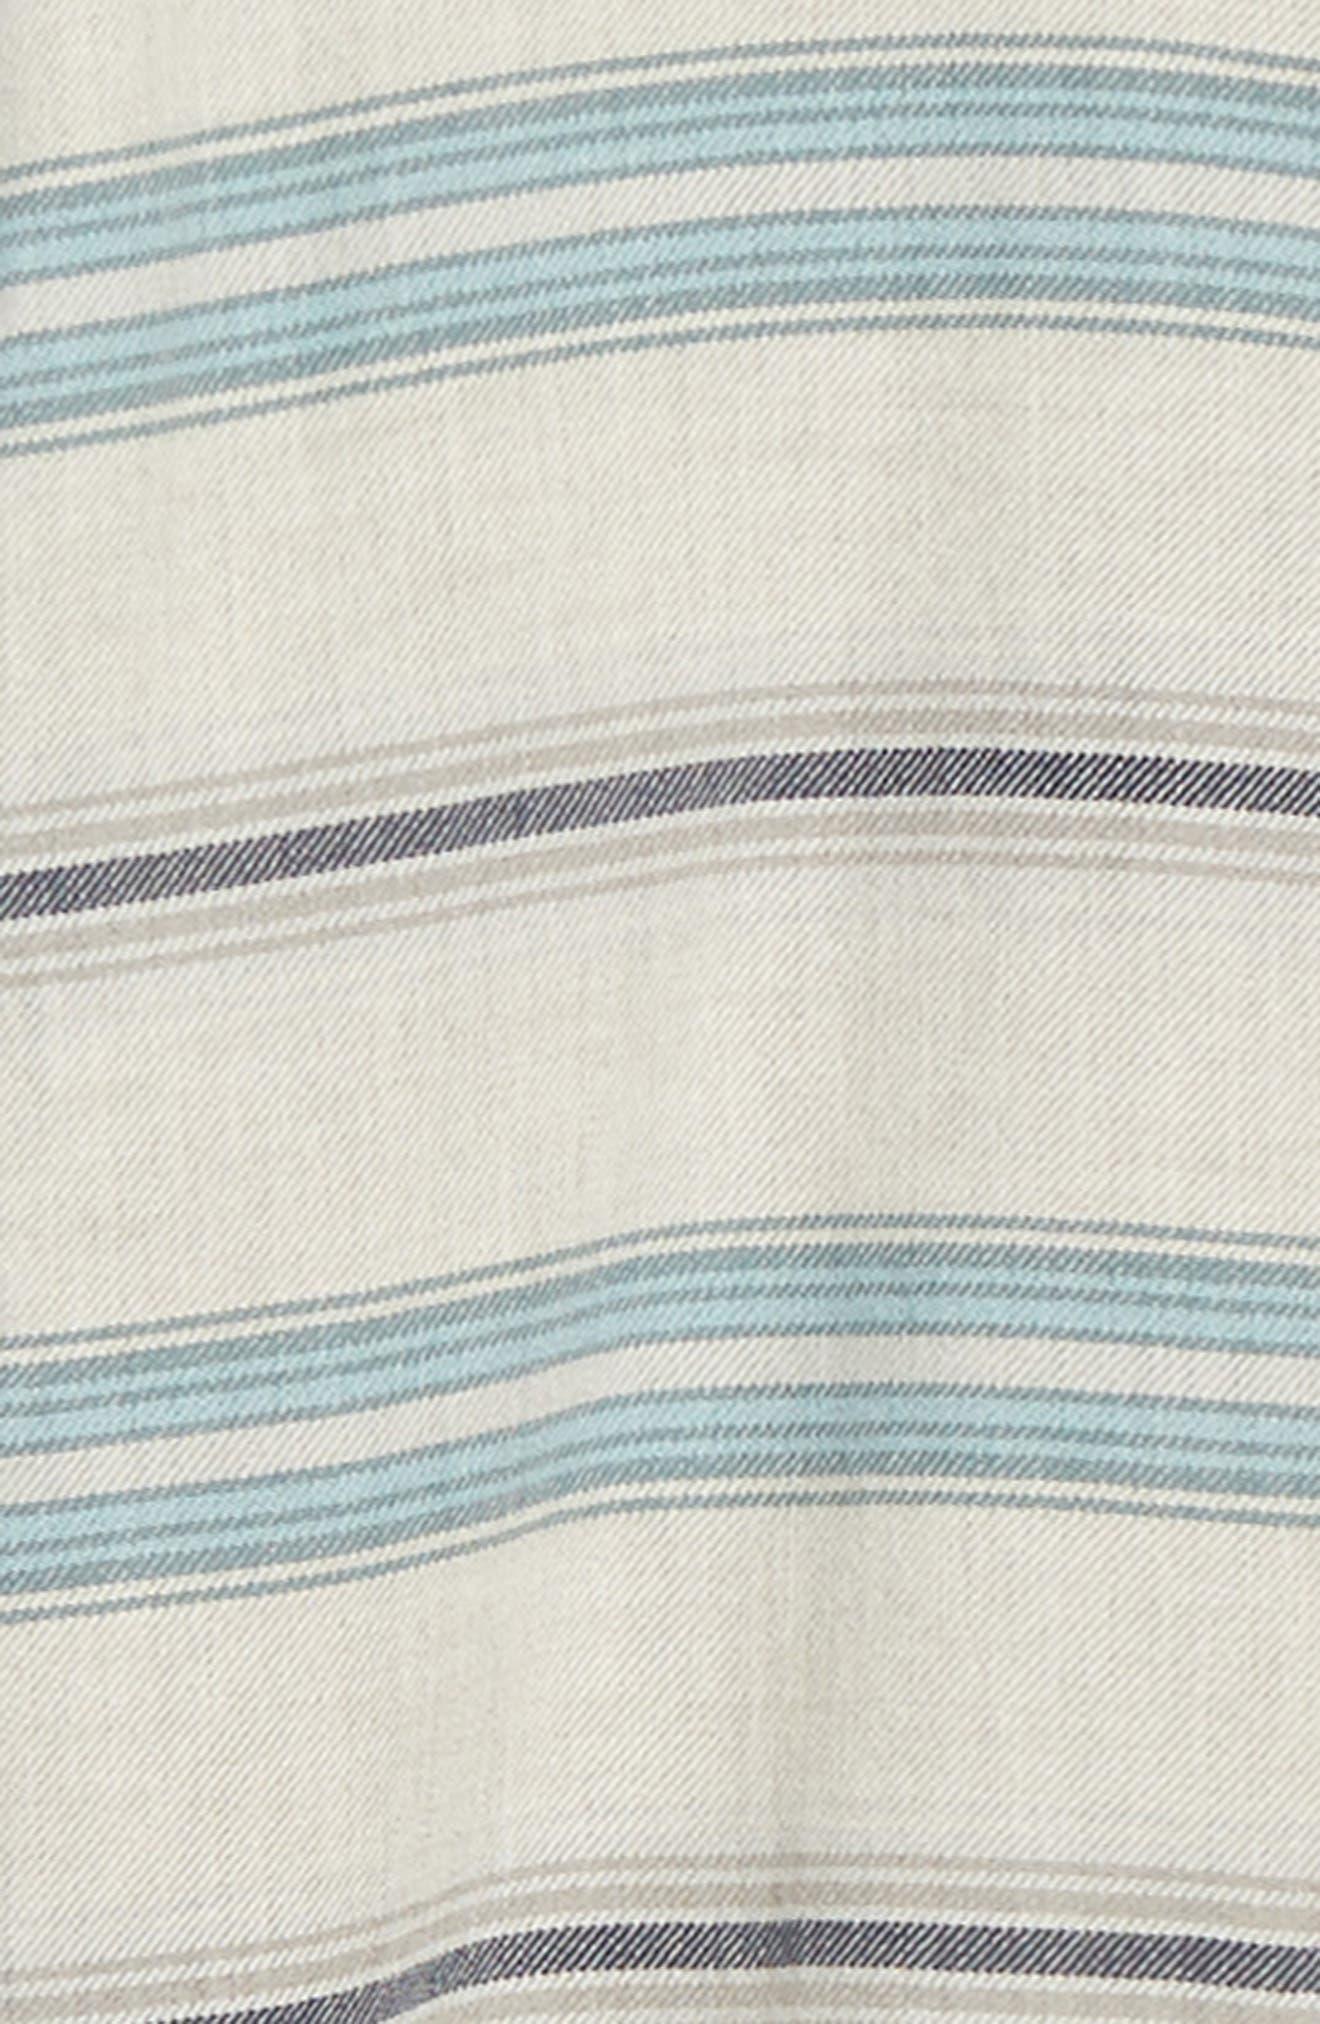 PATAGONIA,                             Regular Fit Organic Cotton Flannel Shirt,                             Alternate thumbnail 6, color,                             TARKINE STRIPE DRIFTER GREY